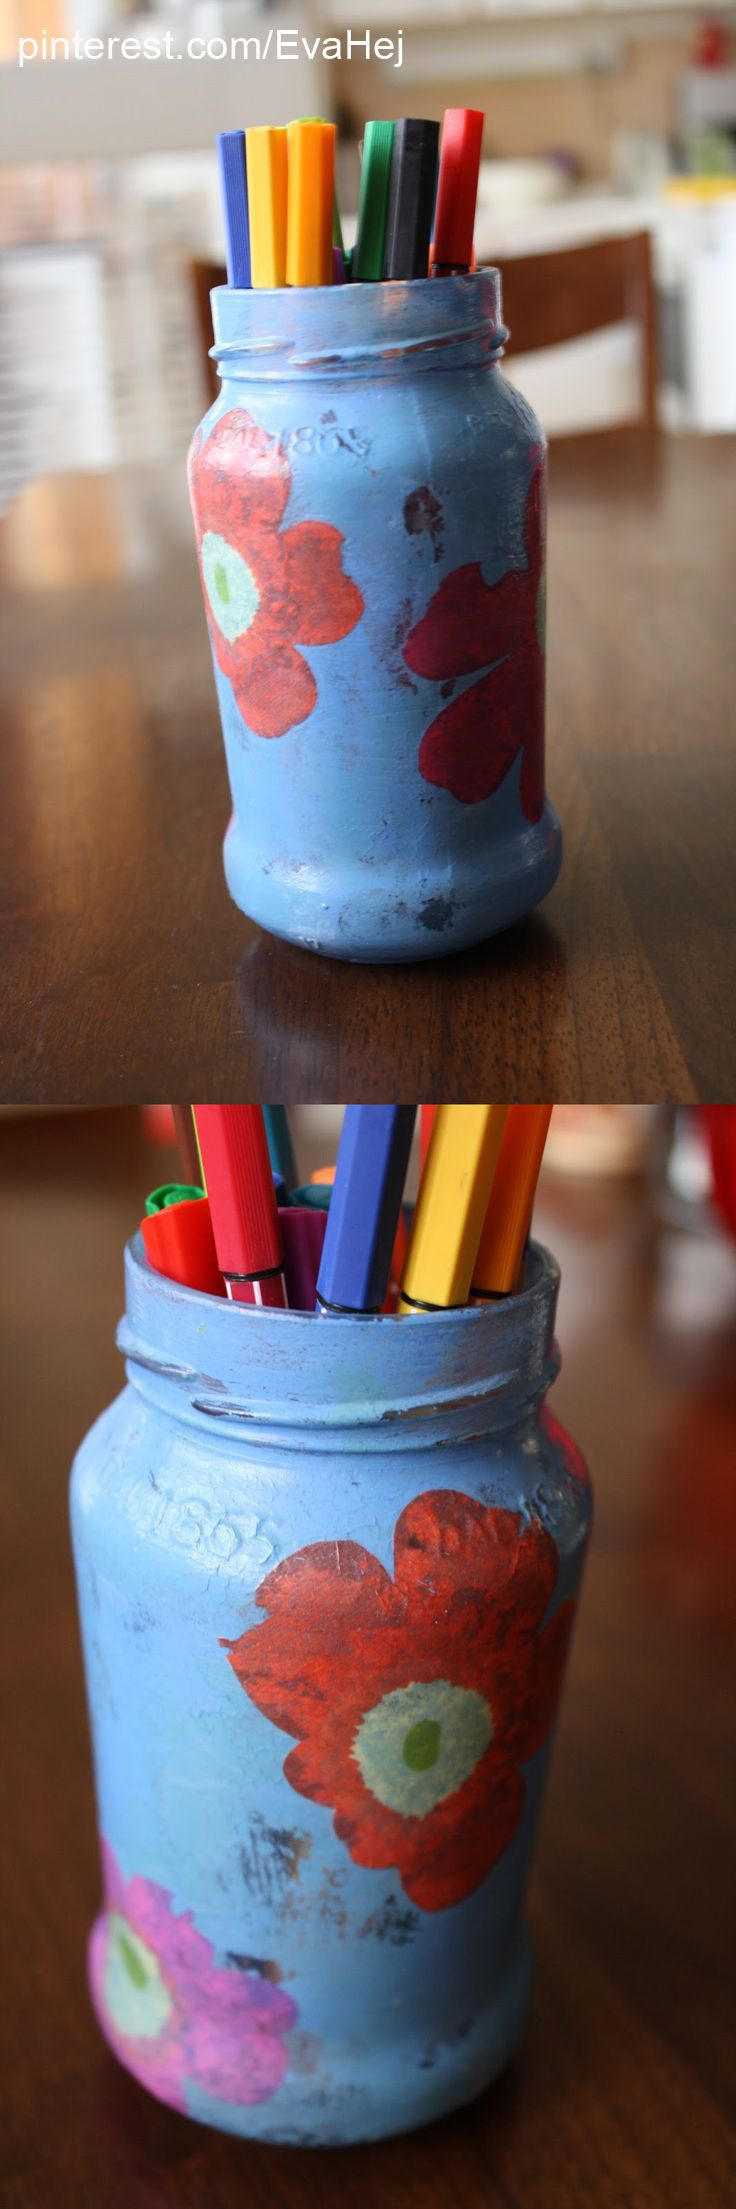 Old jar decoupage